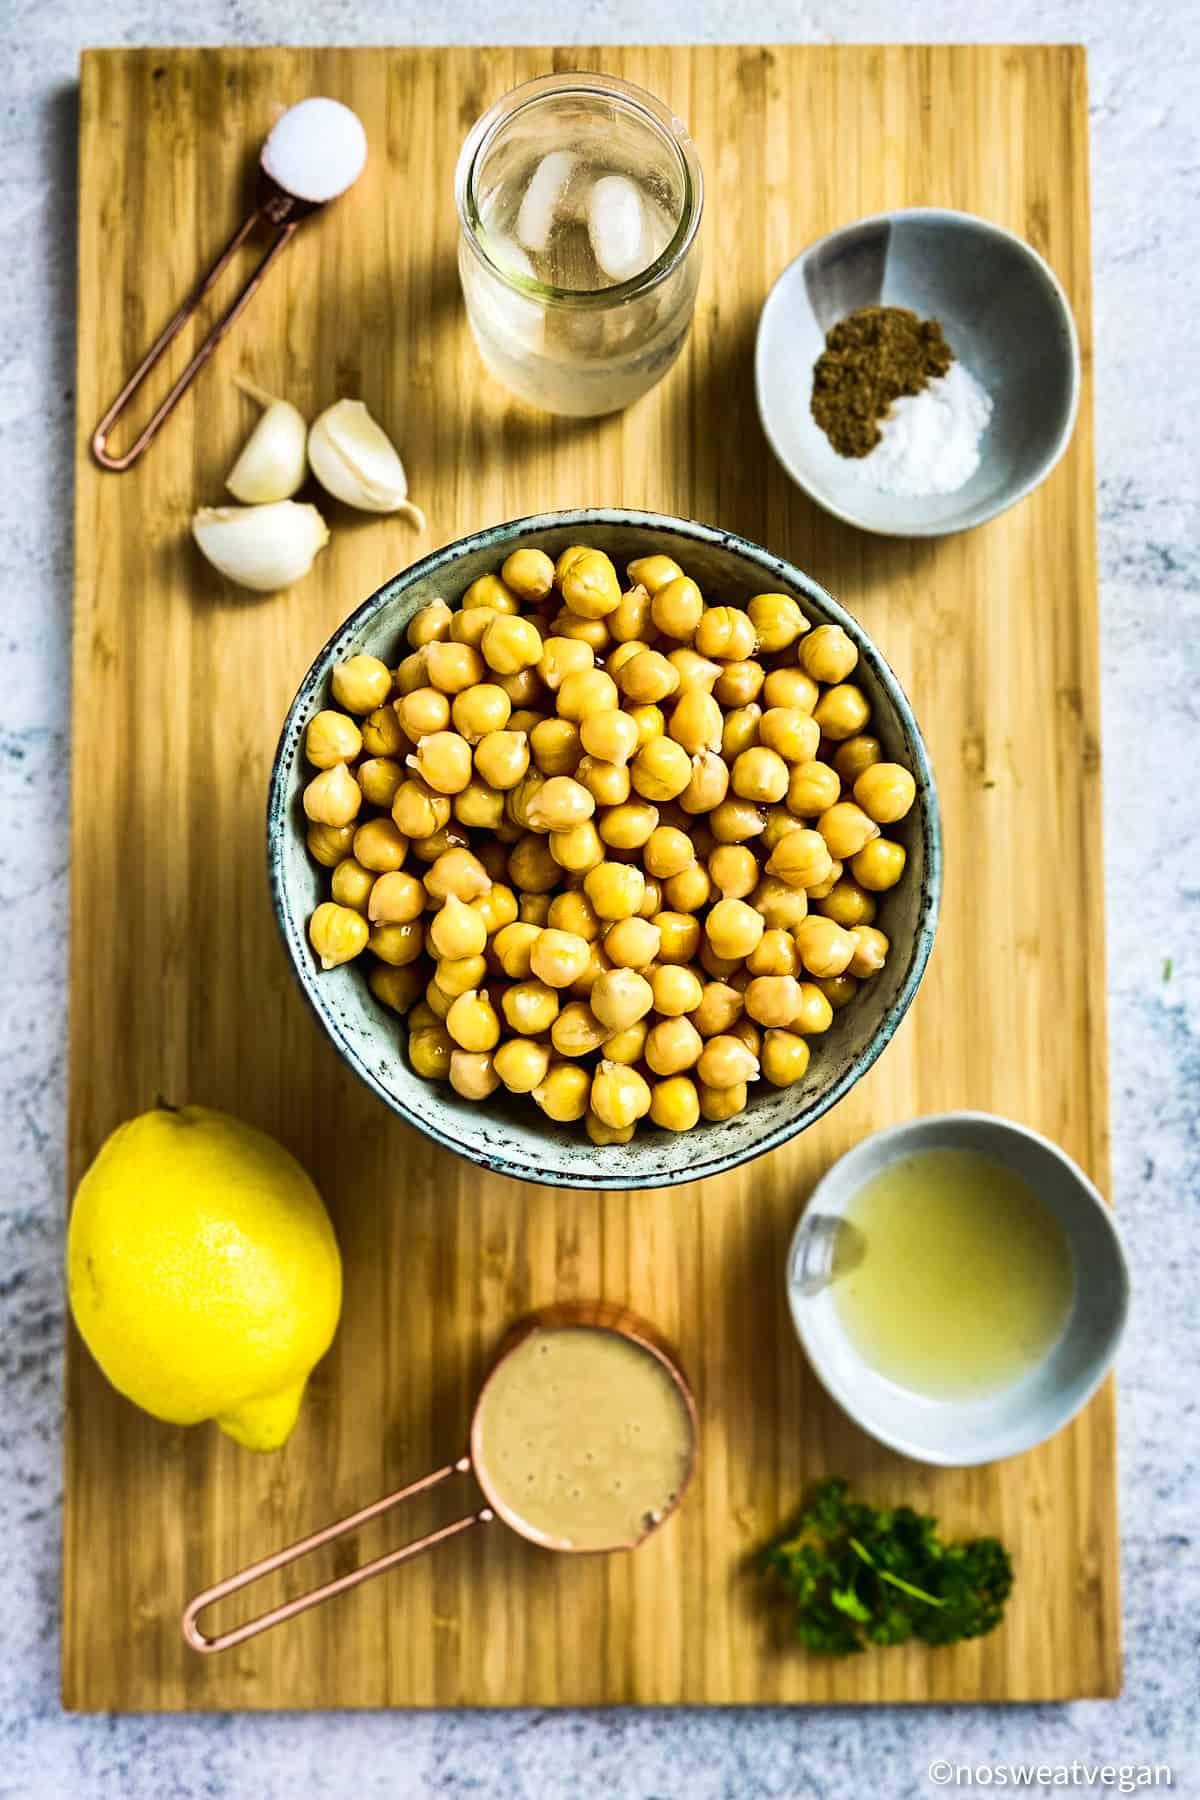 Ingredients for oil-free hummus.